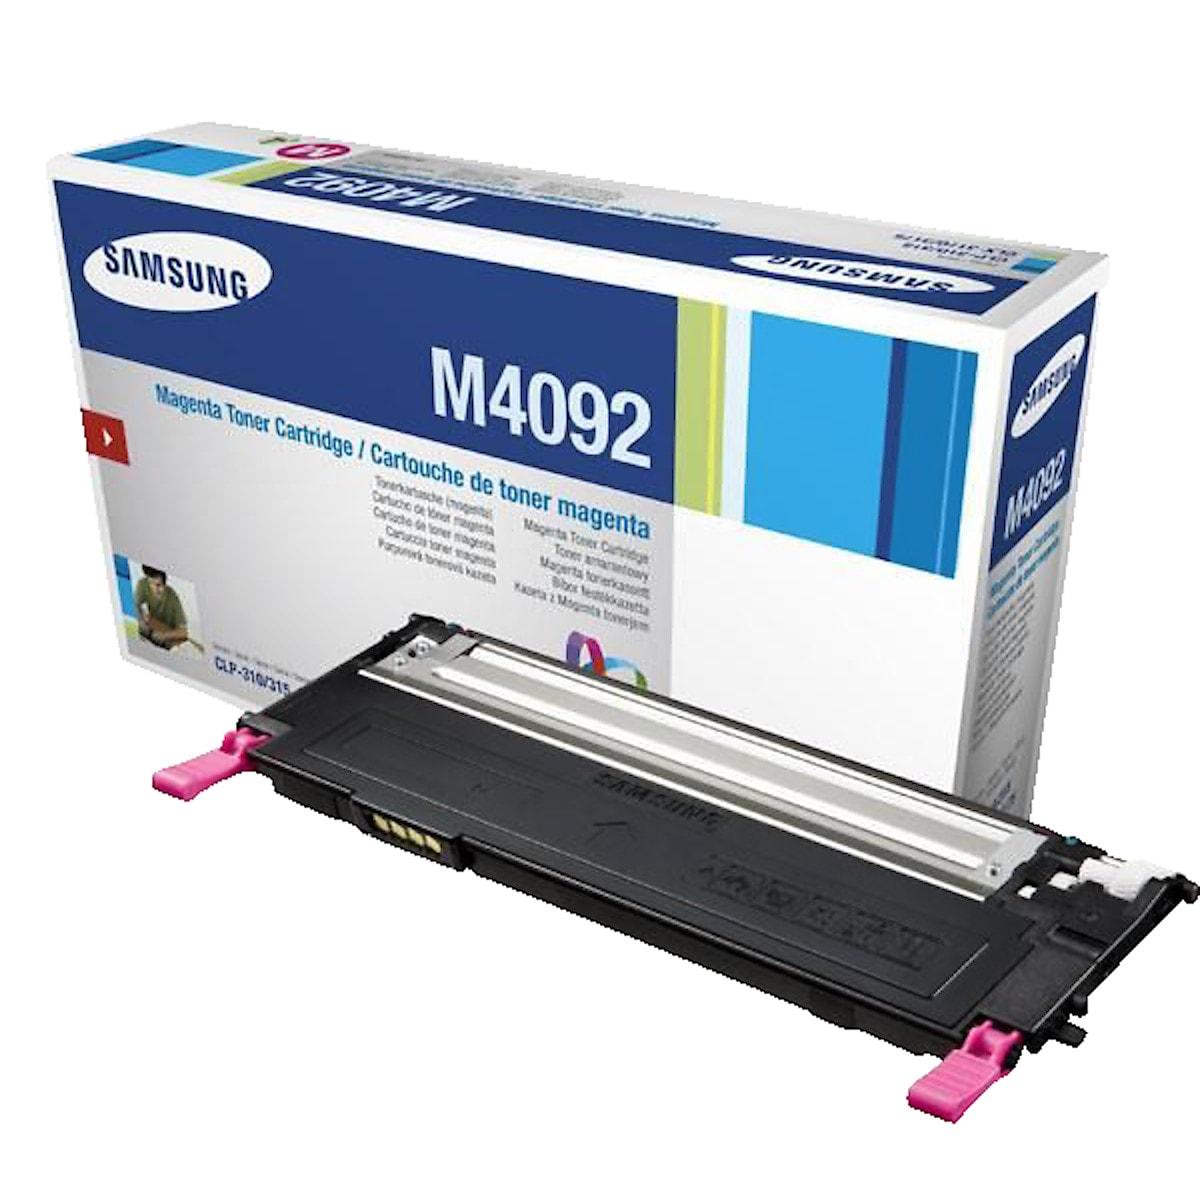 Toner Samsung CLT-4092